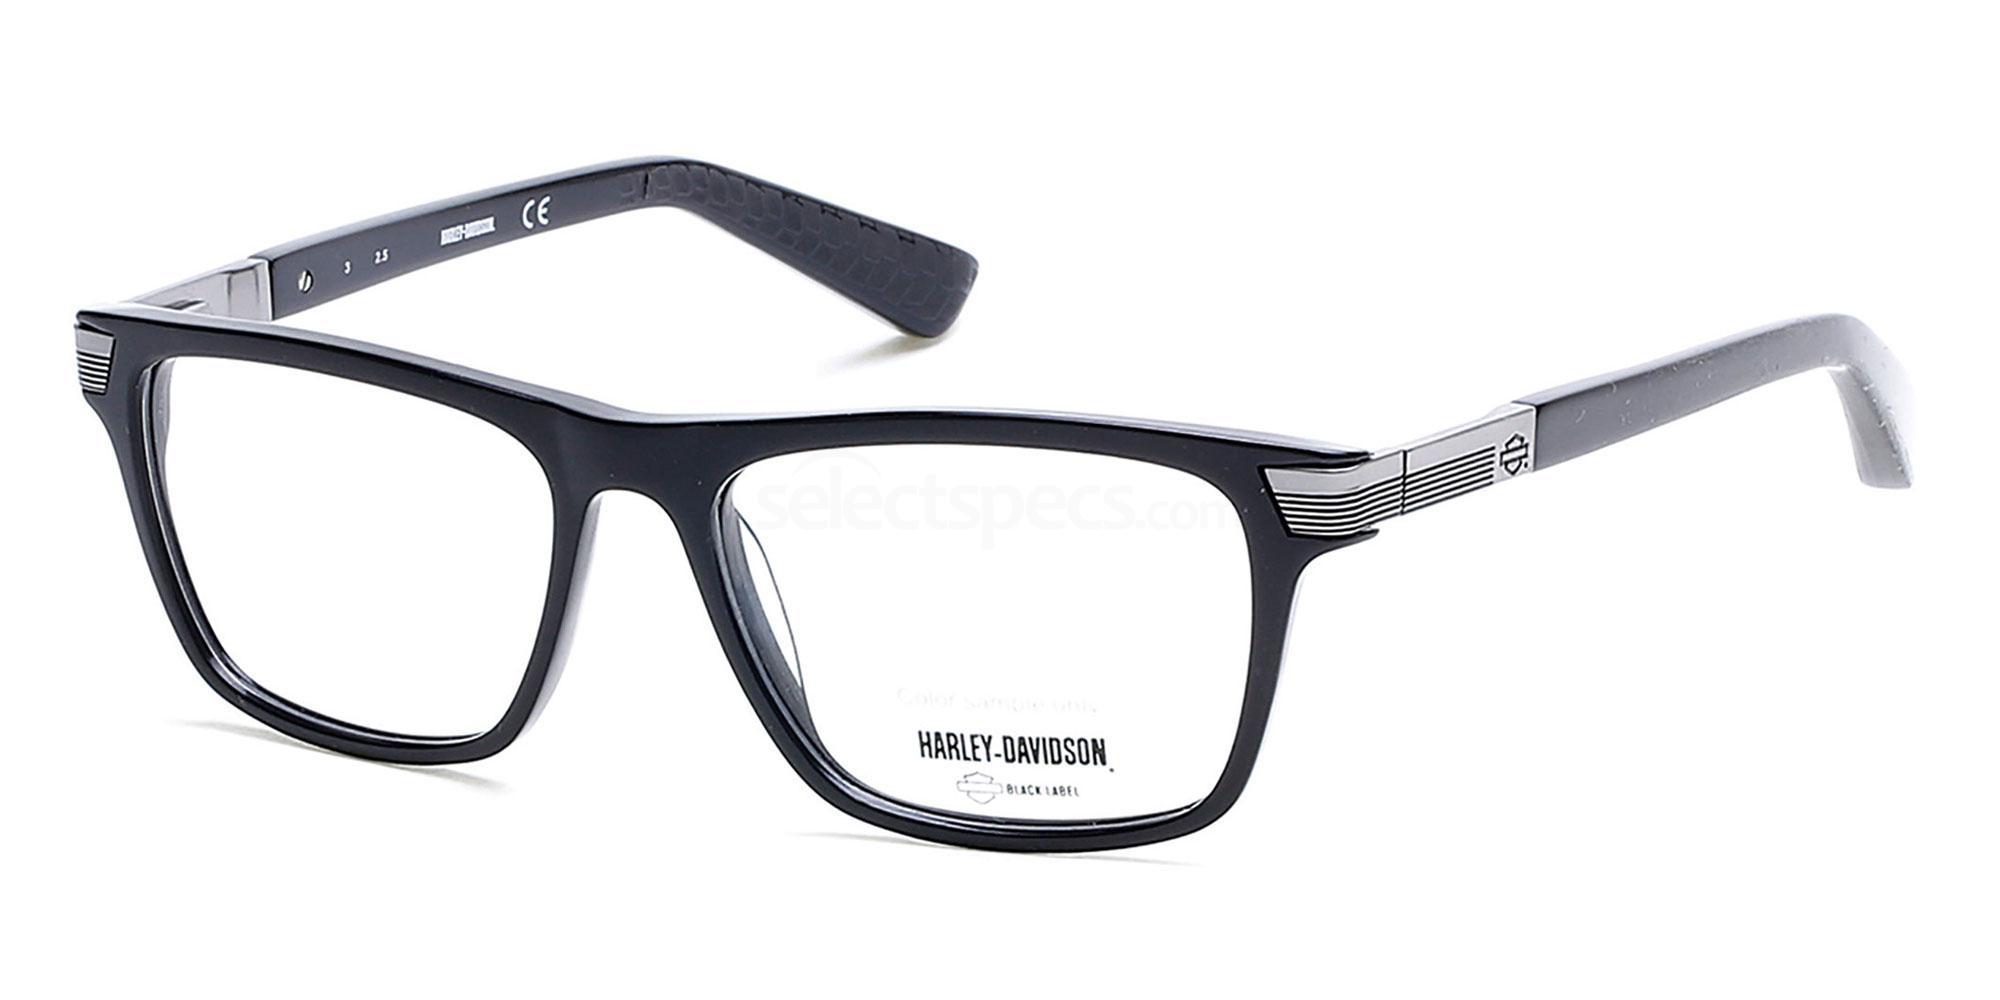 001 HD 1033 Glasses, Harley Davidson